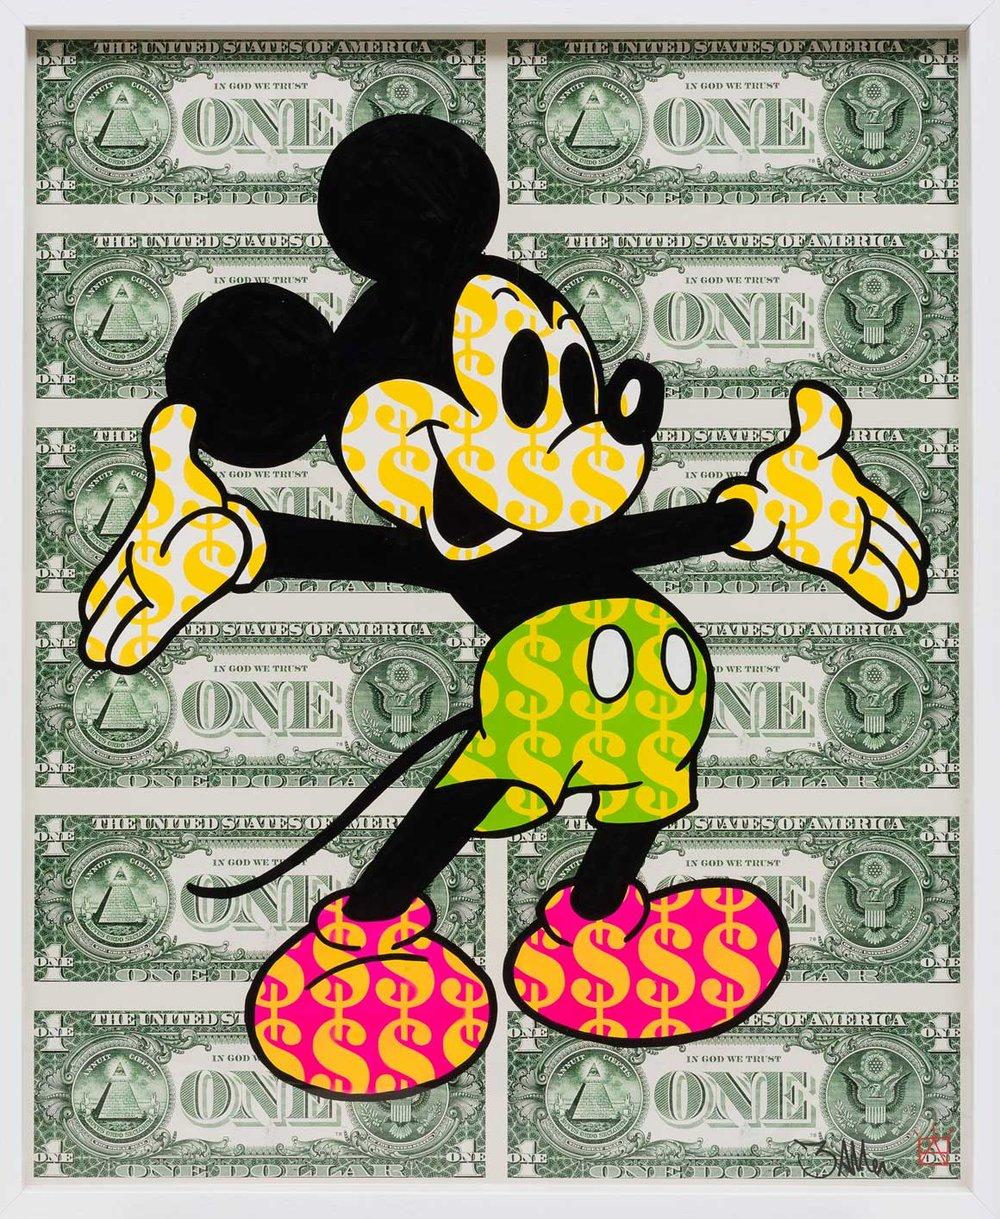 BenAllen_Monster_Mickey_NeonPink_110cmx135cm_FRAMEDONLY_Acrylic_spraypaint_stencil_giclee_320gsmpaper_£.jpg